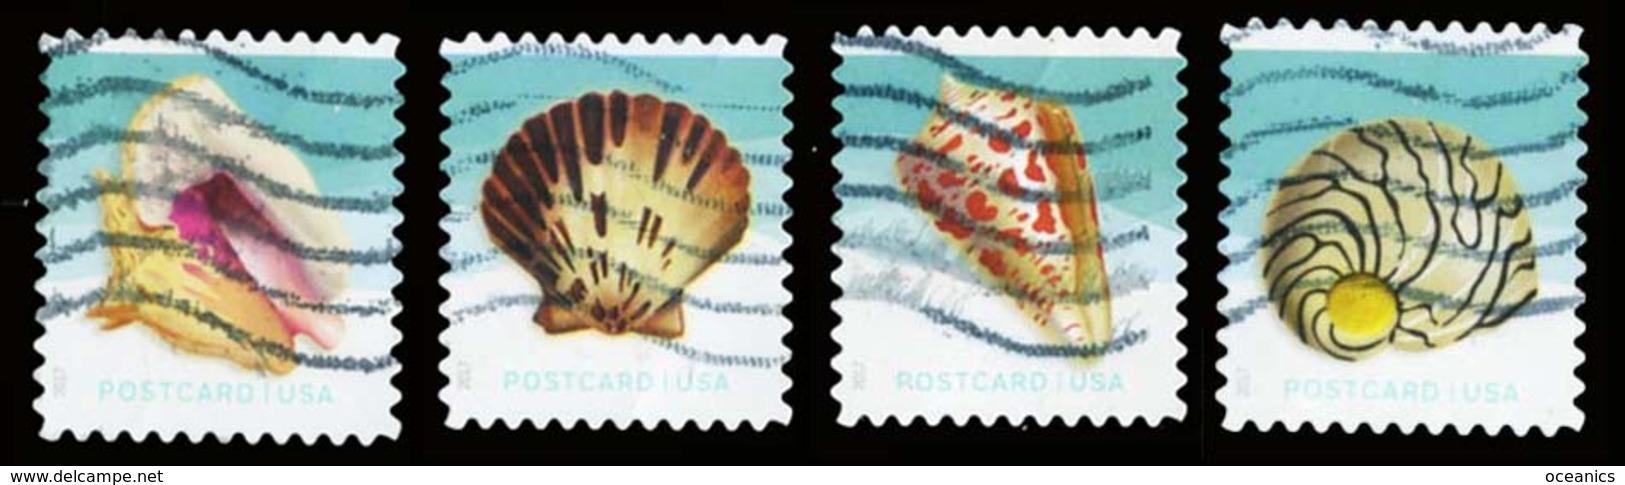 Etats-Unis / United States (Scott No.5163-6 - Shells) (o)set - Gebruikt